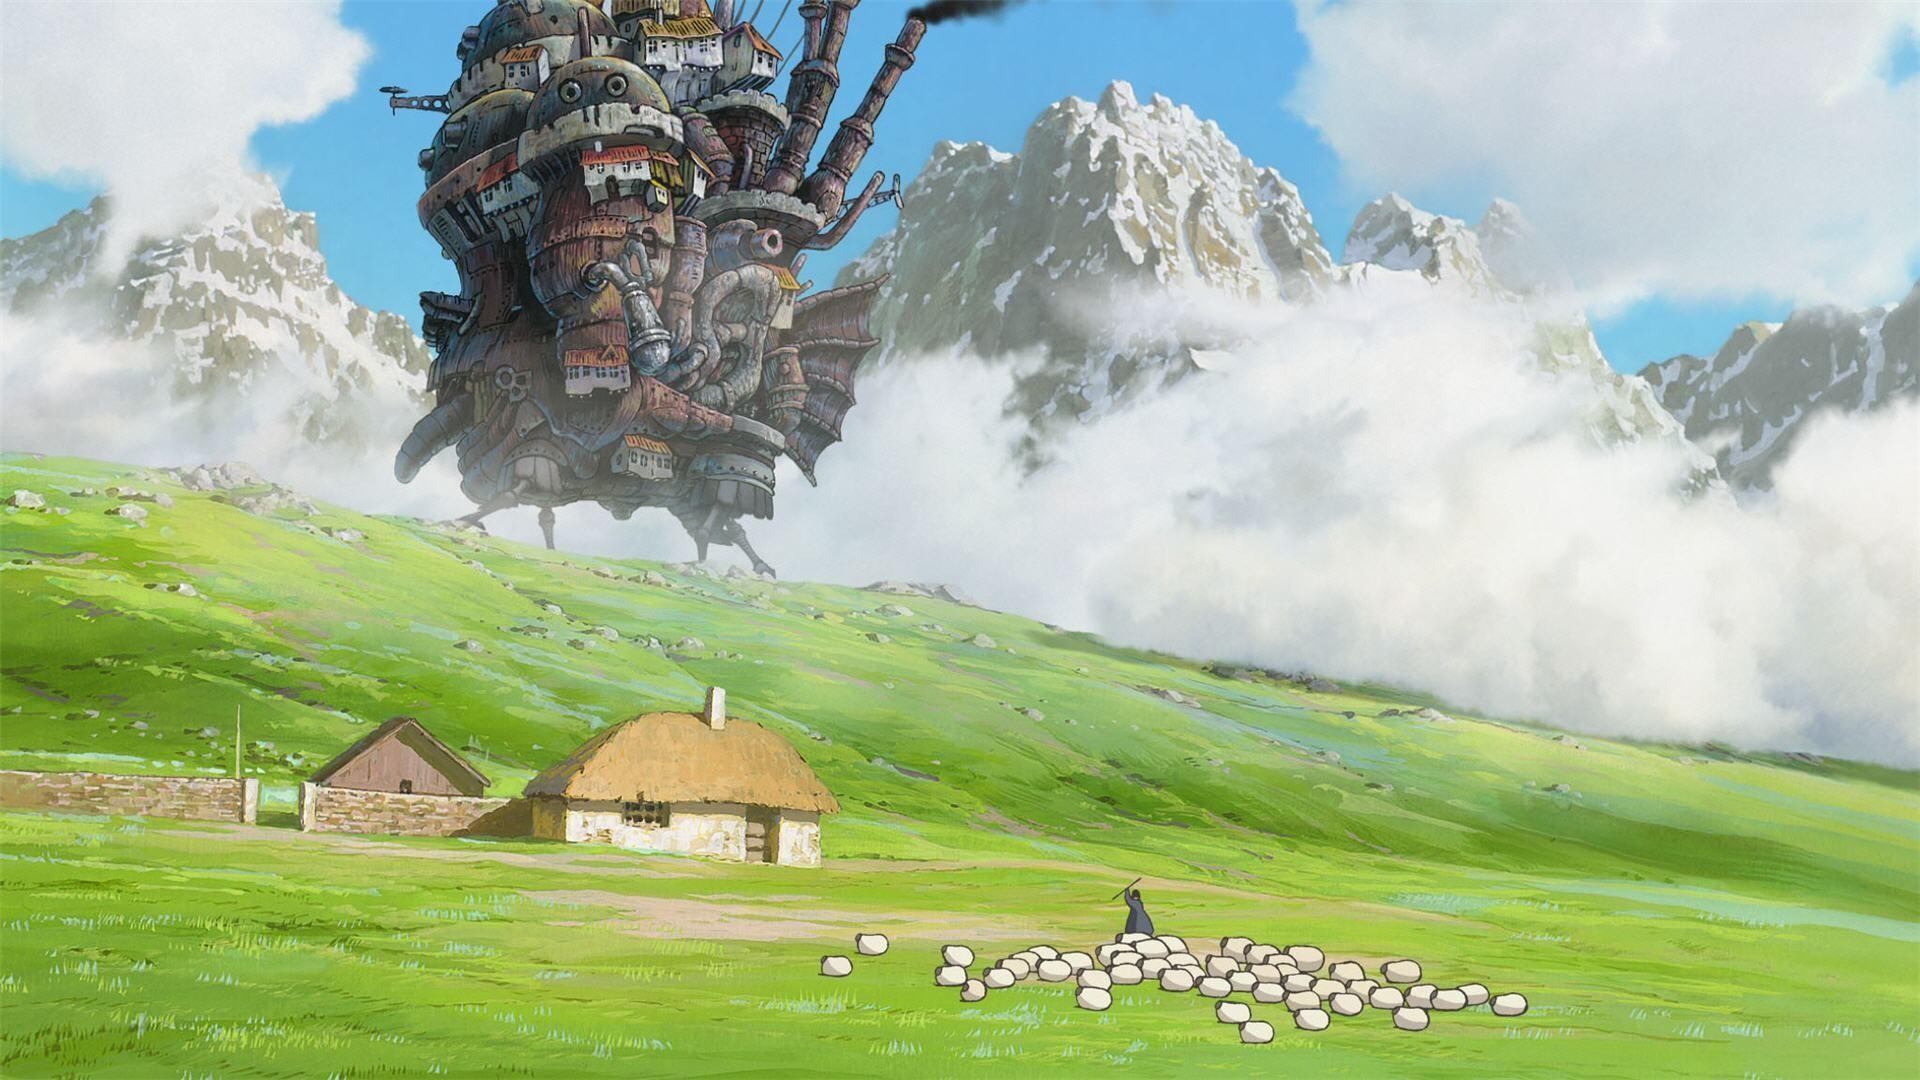 Wallpaper Landscape Anime Valley My Neighbor Totoro Studio Ghibli Alps Hayao Miyazaki Plateau Terrain Grassland Meadow Plain Screenshot